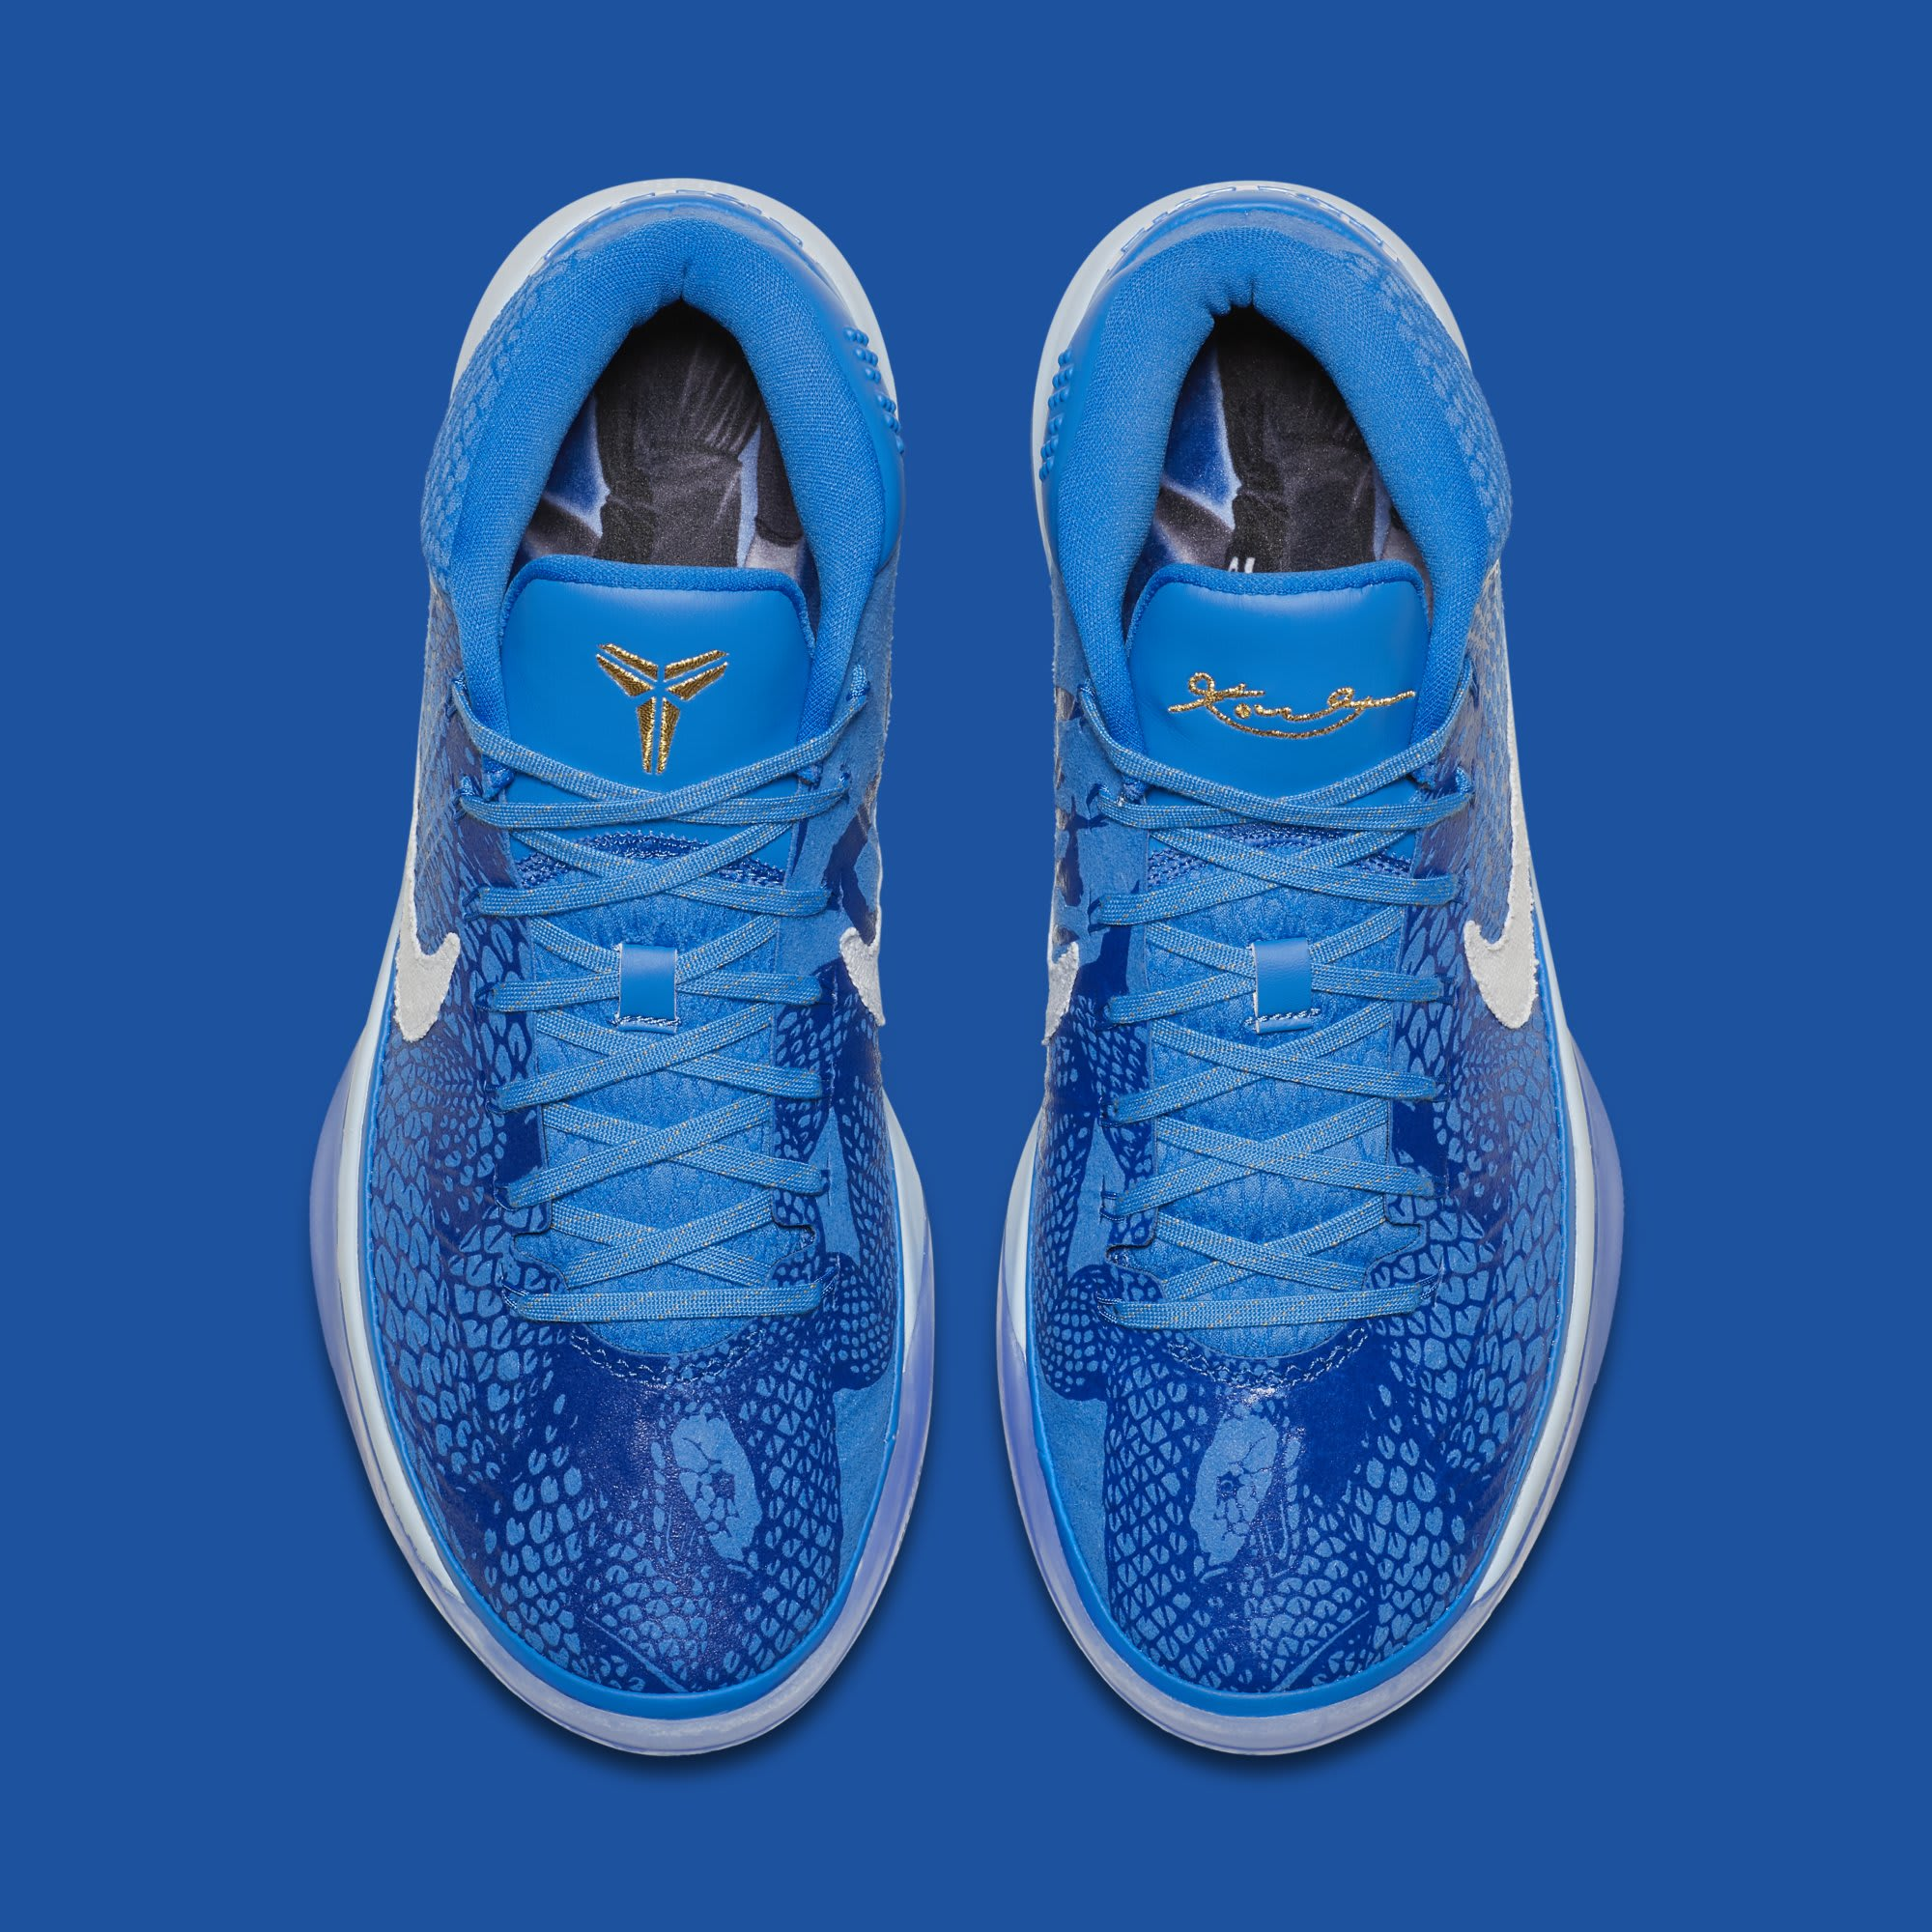 huge selection of 75db6 aebc3 Nike Kobe A.D. Mid DeMar DeRozan PE AA2722-900 Release Date ...